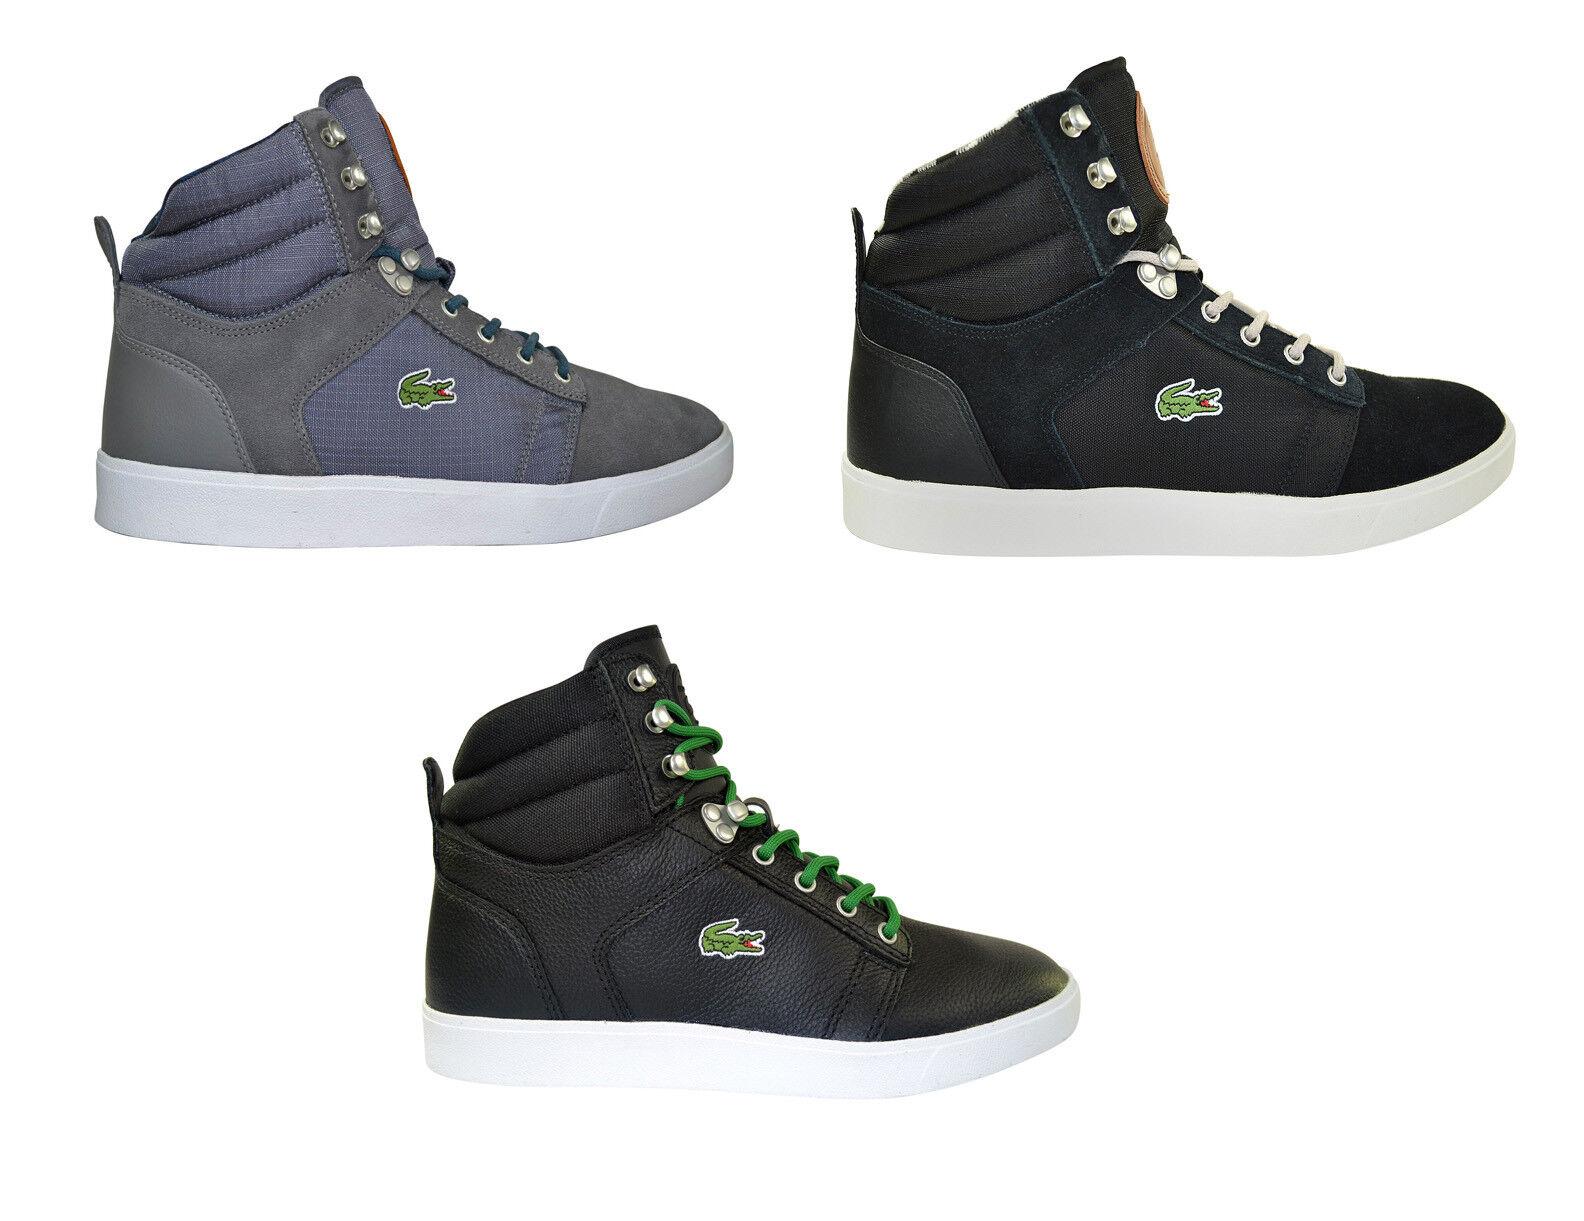 Lacoste Orelle URW, SPM dark grey, grey/black, black Schuhe/Boots/Sneaker